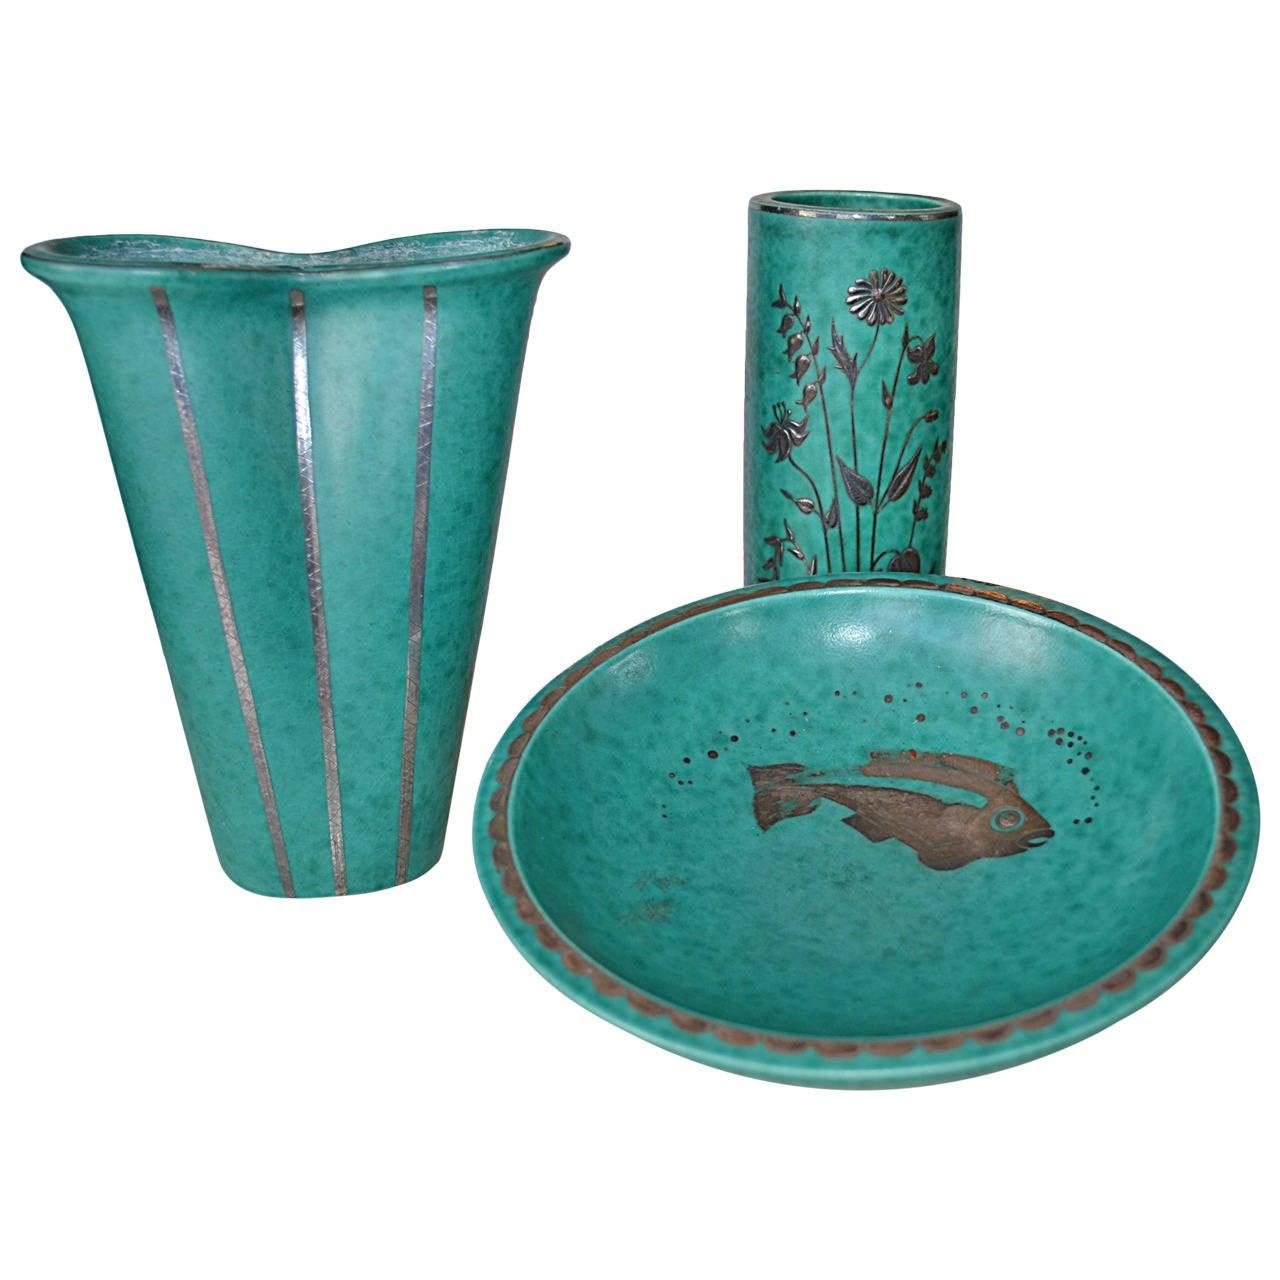 Wilhelm Kage Ceramics Argenta for Gustavsberg 1930's